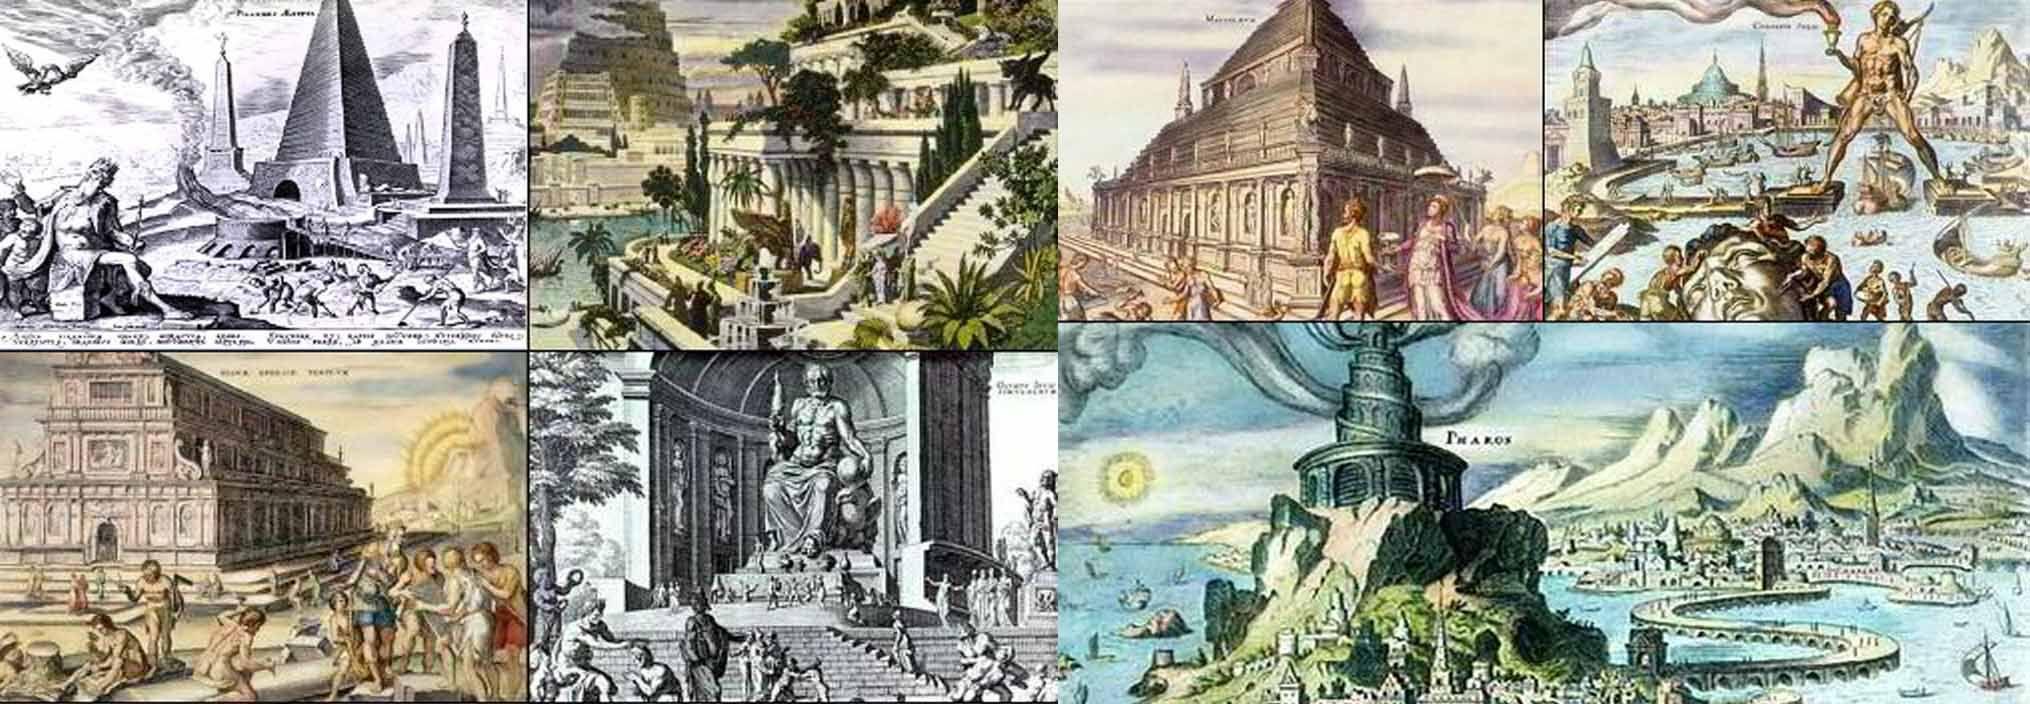 Seven Ancient Wonders.jpg (2030×704) - http://www.blogadilla.com ...